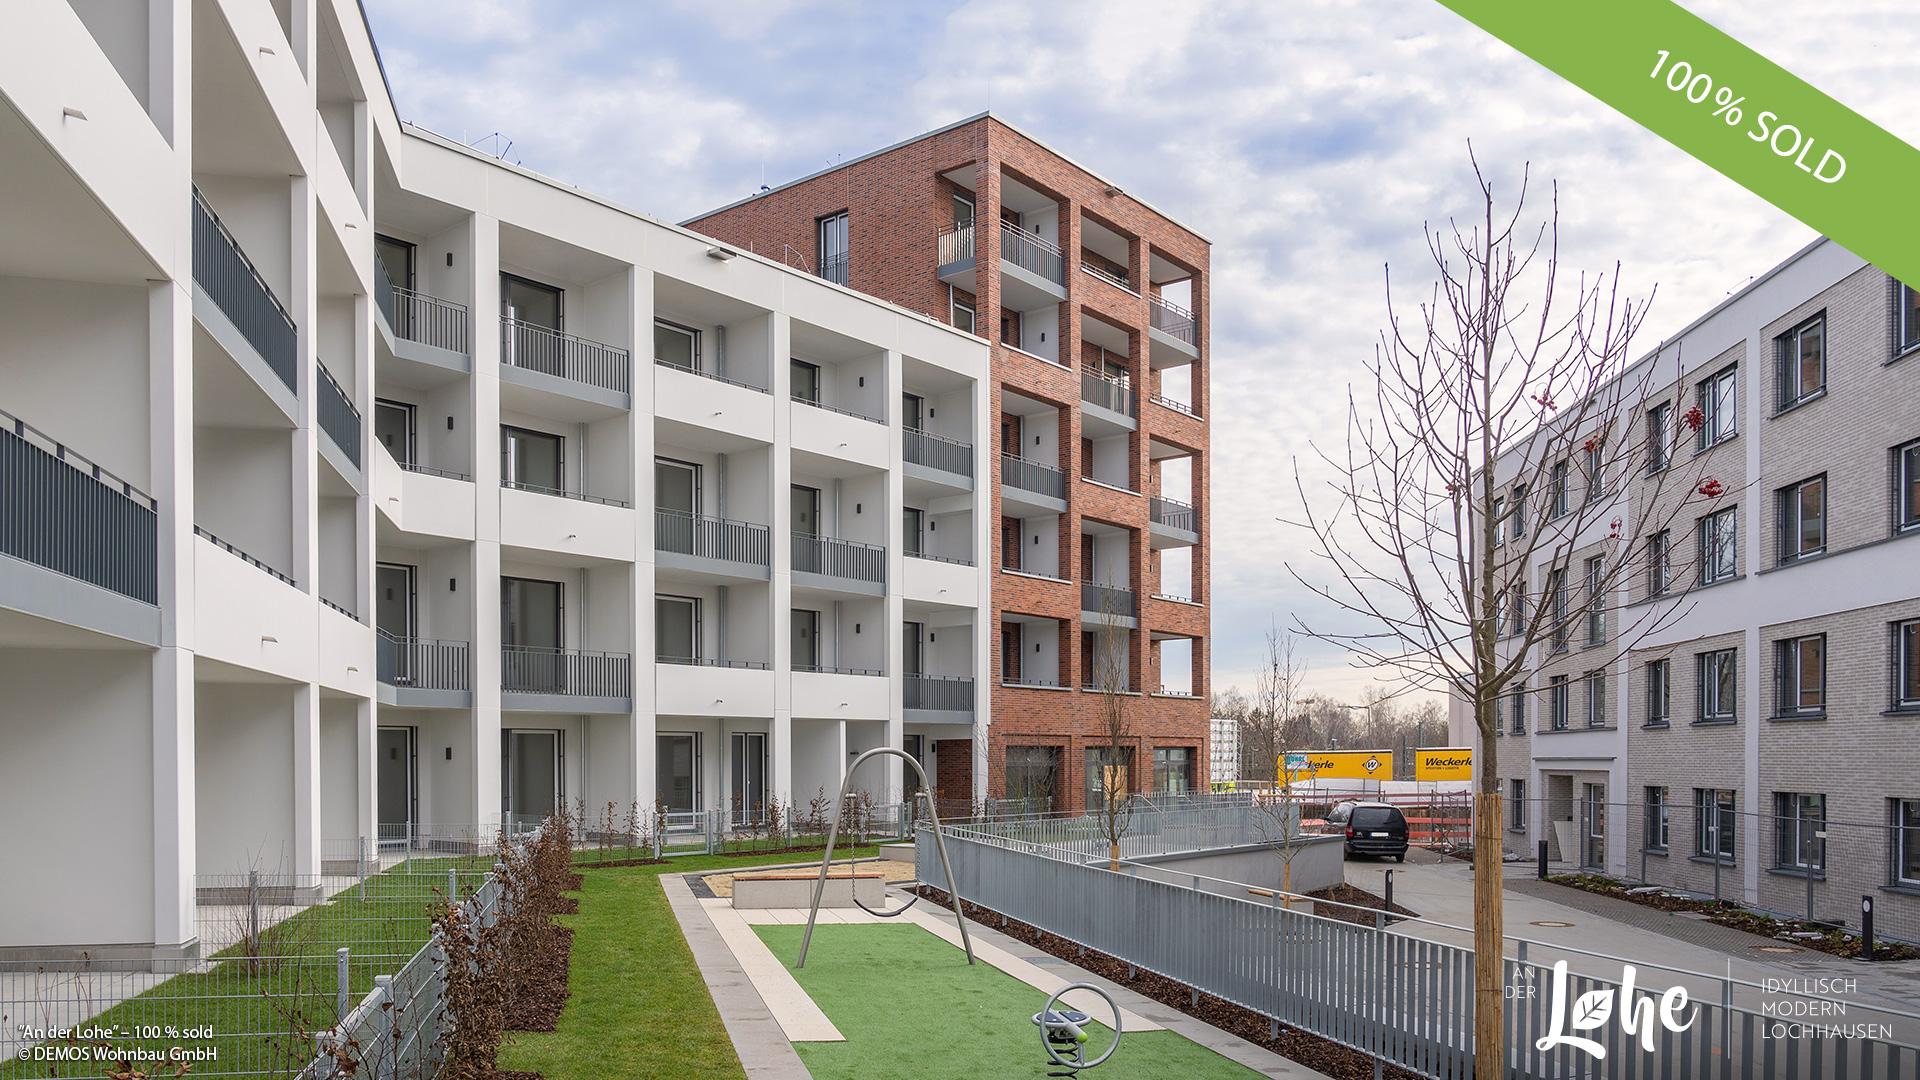 'An der Lohe' in Munich-Lochhausen: All condominiums are sold